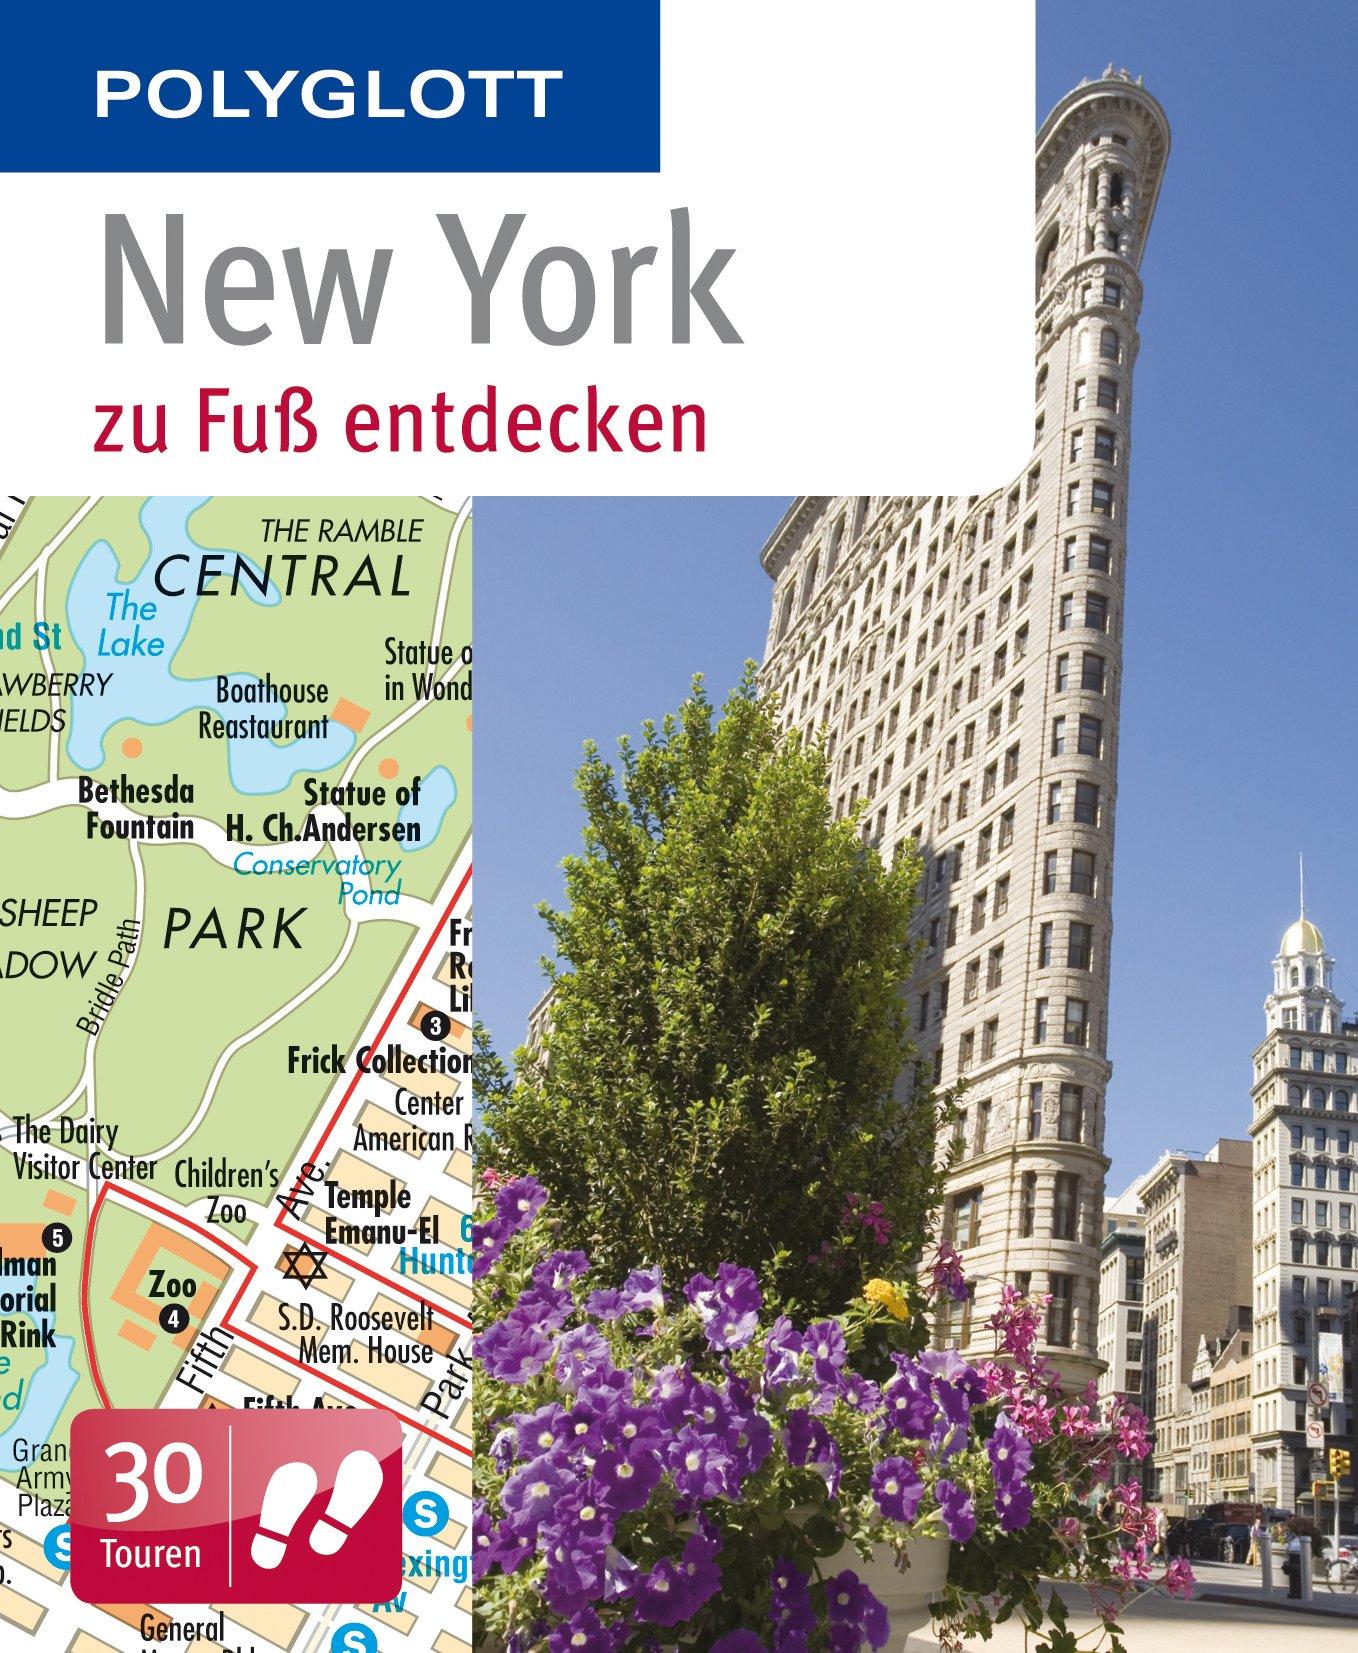 POLYGLOTT Reiseführer New York zu Fuß entdecken (POLYGLOTT zu Fuß entdecken)